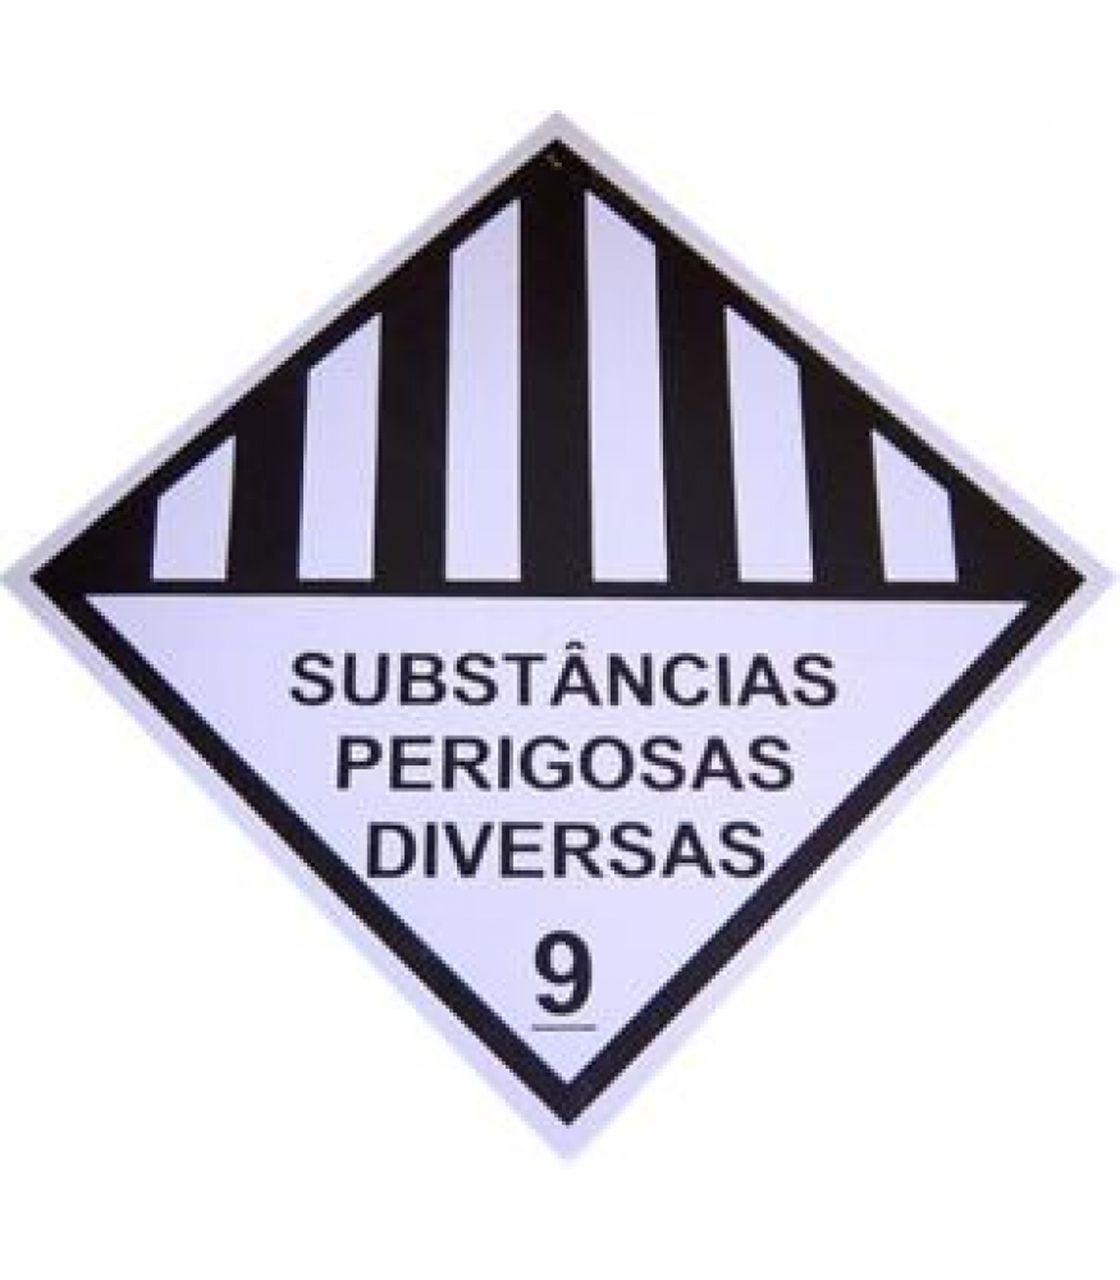 Placa Simbologia 9 - Subst Perigosa Diver - 33 X 33